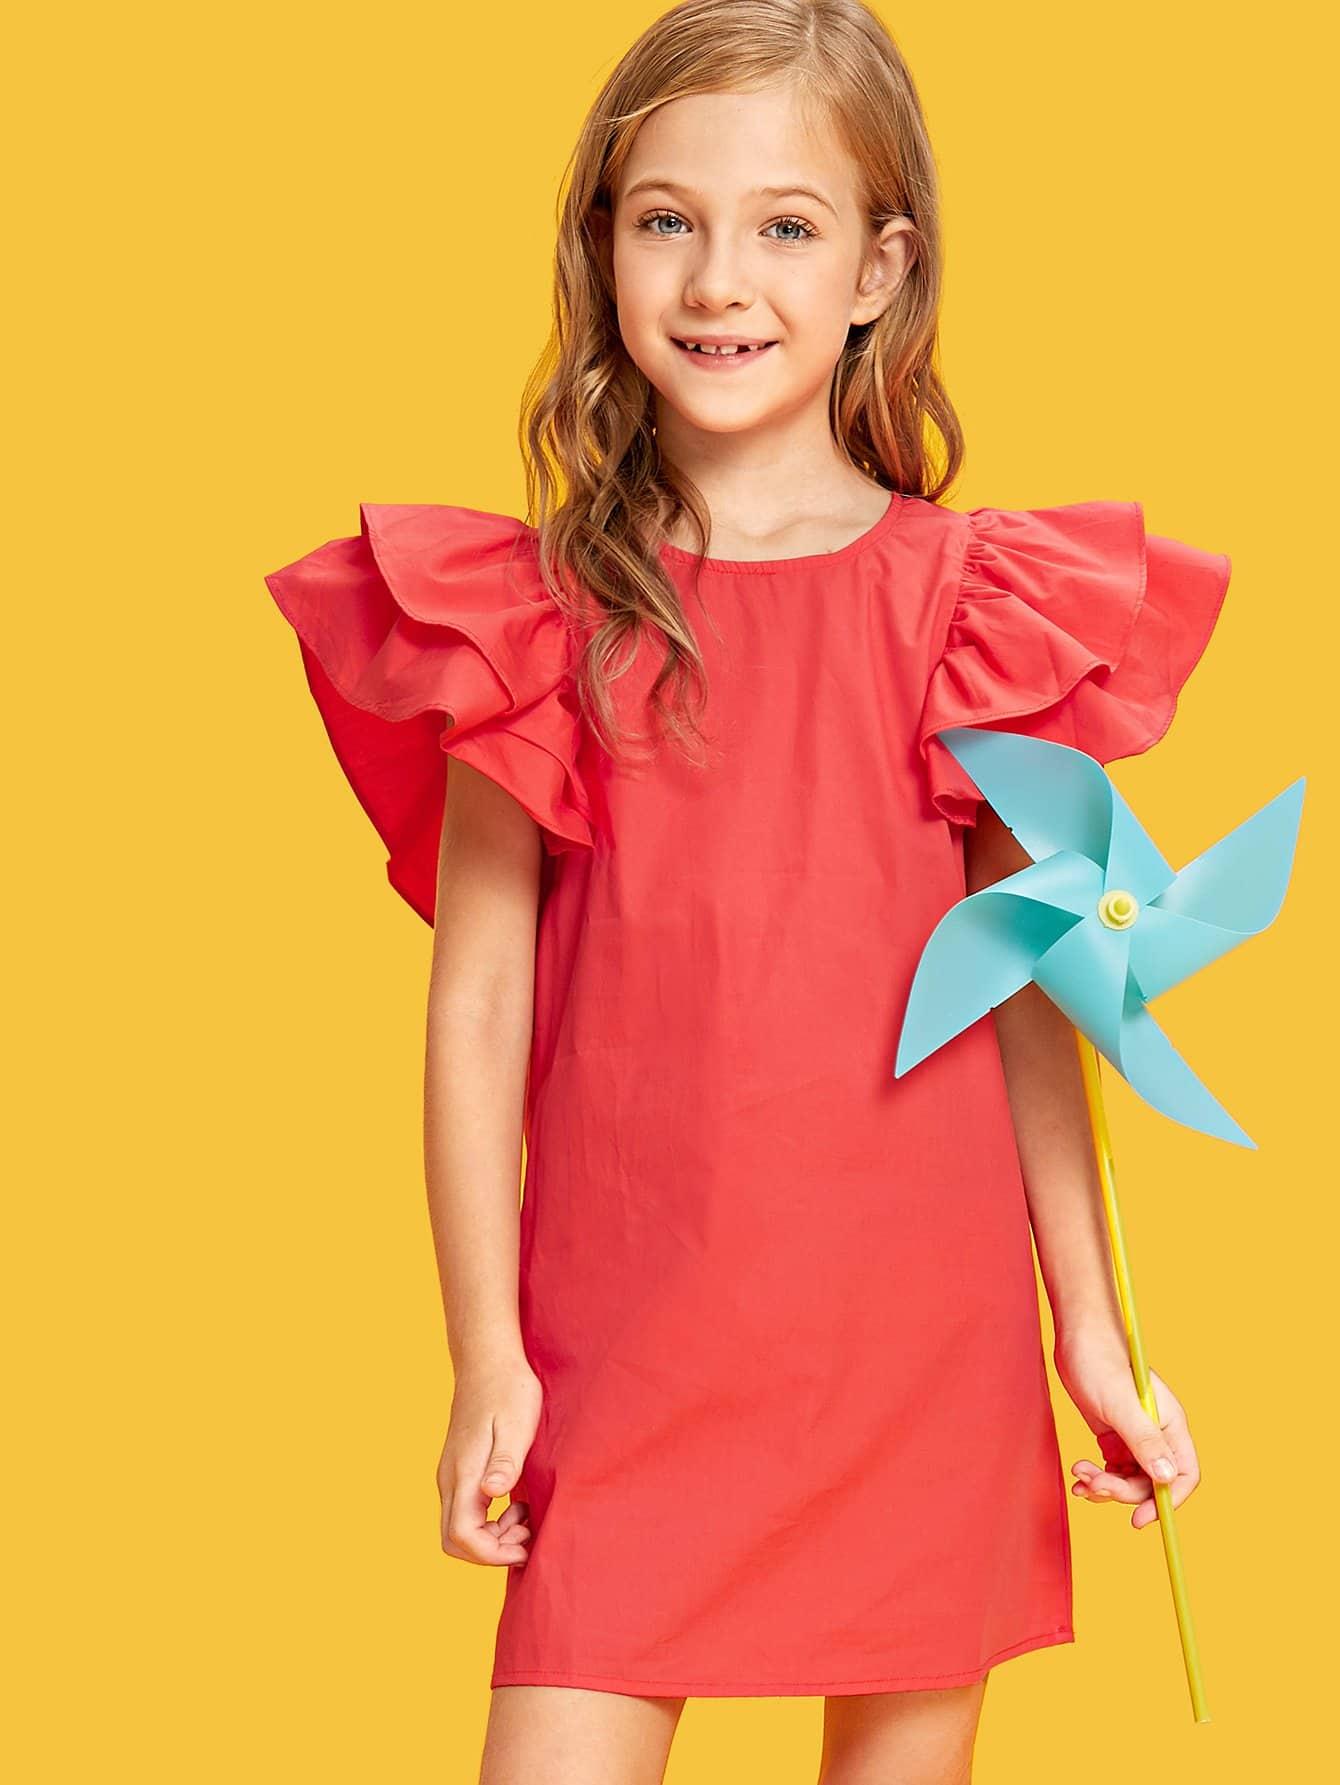 Girls Layered Ruffle Sleeve Dress мультиварка scarlett sc mc410s14 серебристый белый sc mc410s14